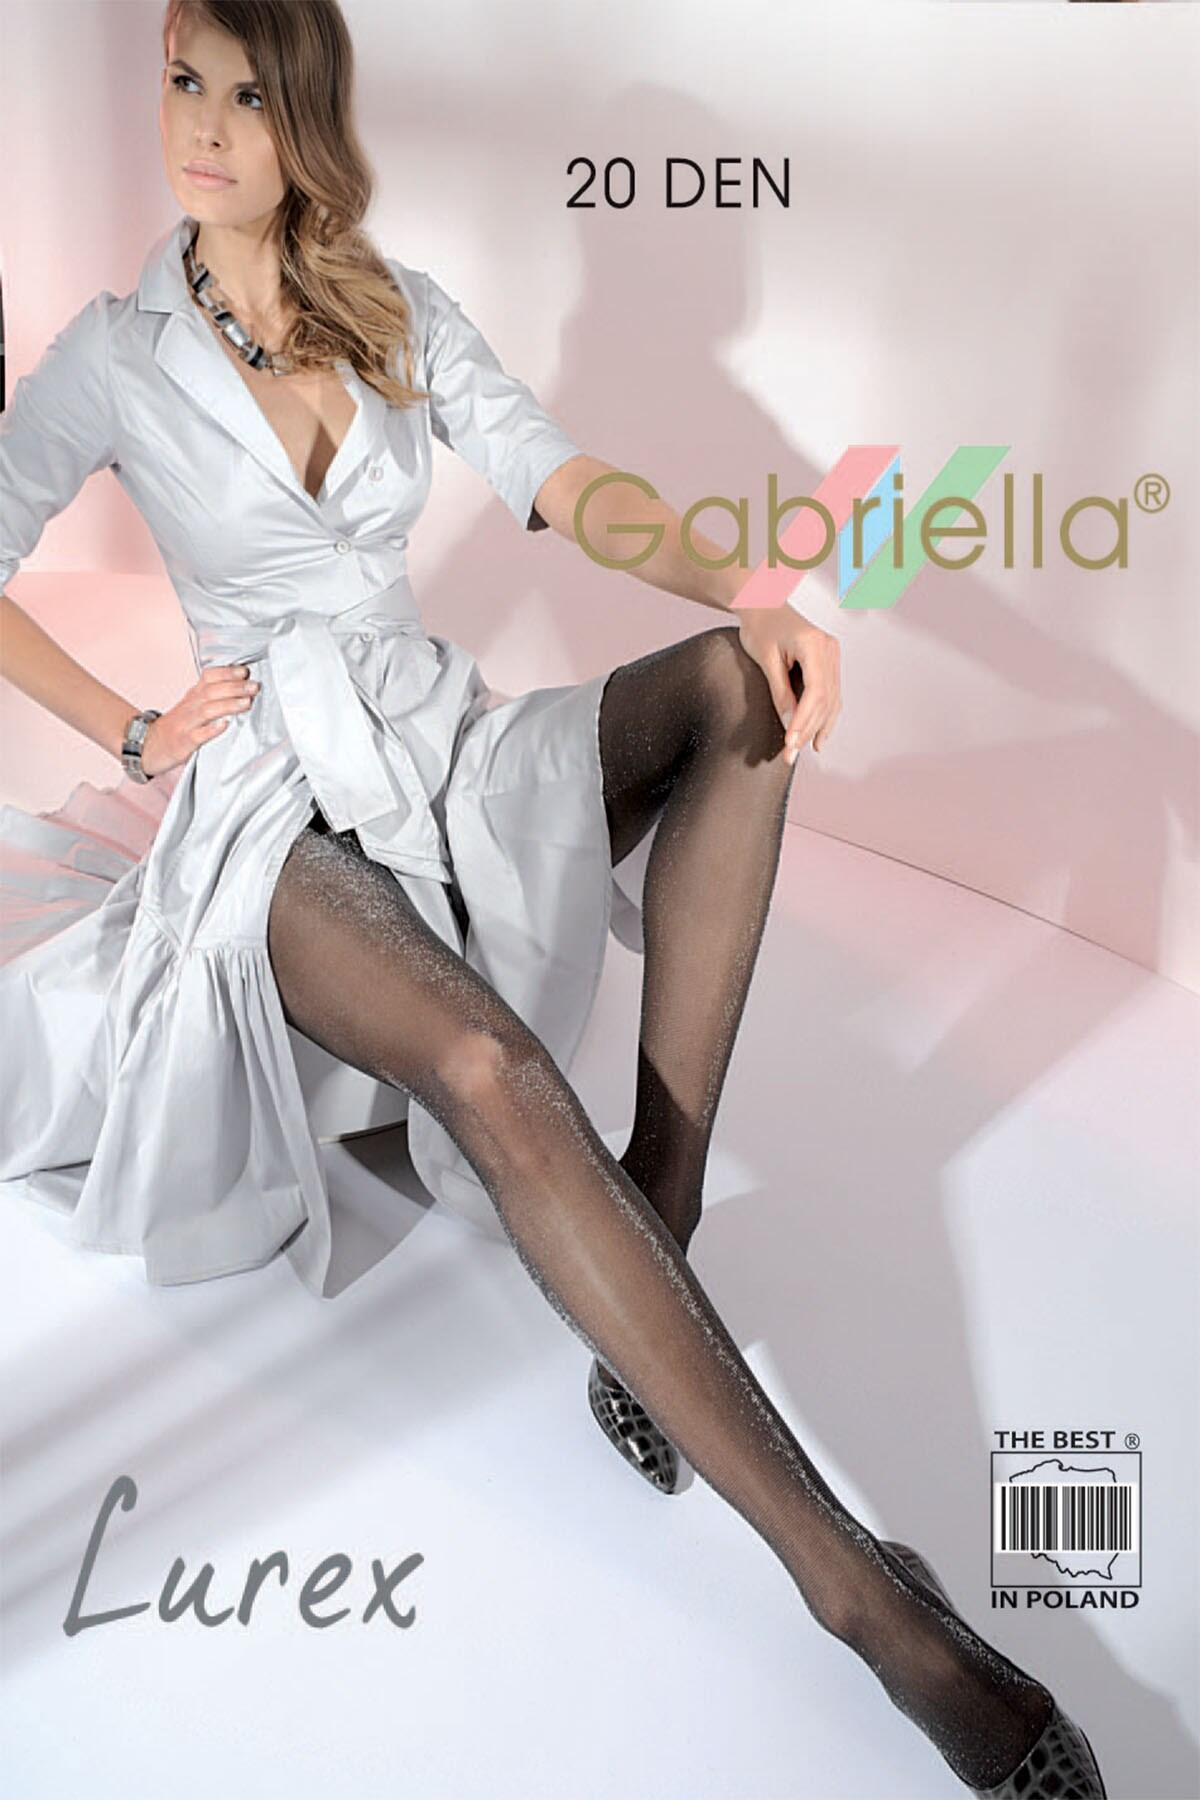 Gabriella Lurex 20 Denier Silky Tight  - Black/Silver